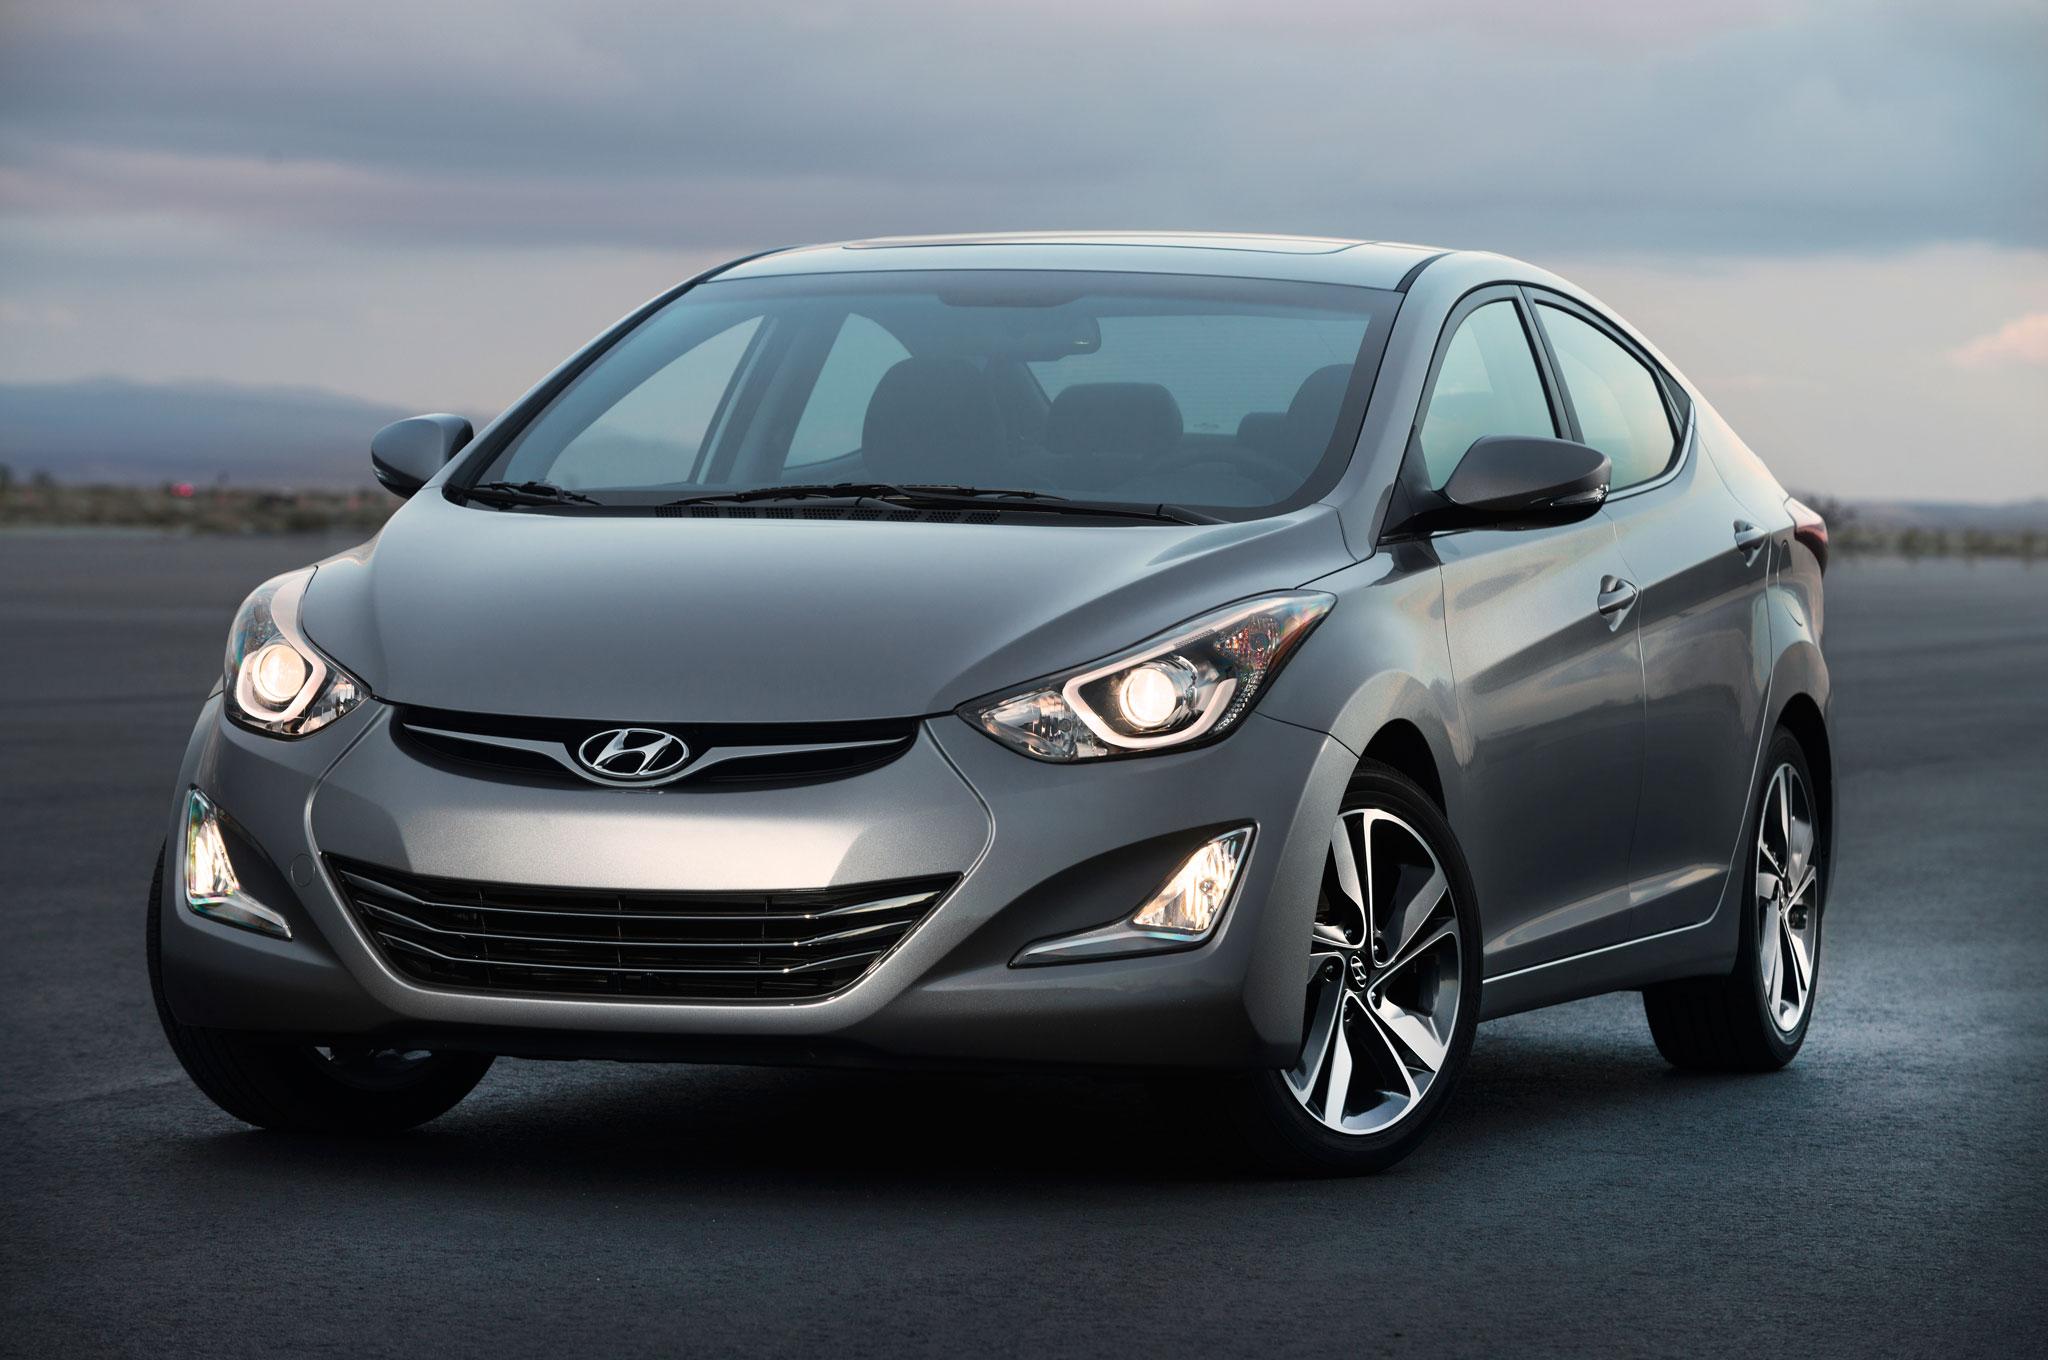 2014 Hyundai Elantra Front Left View1